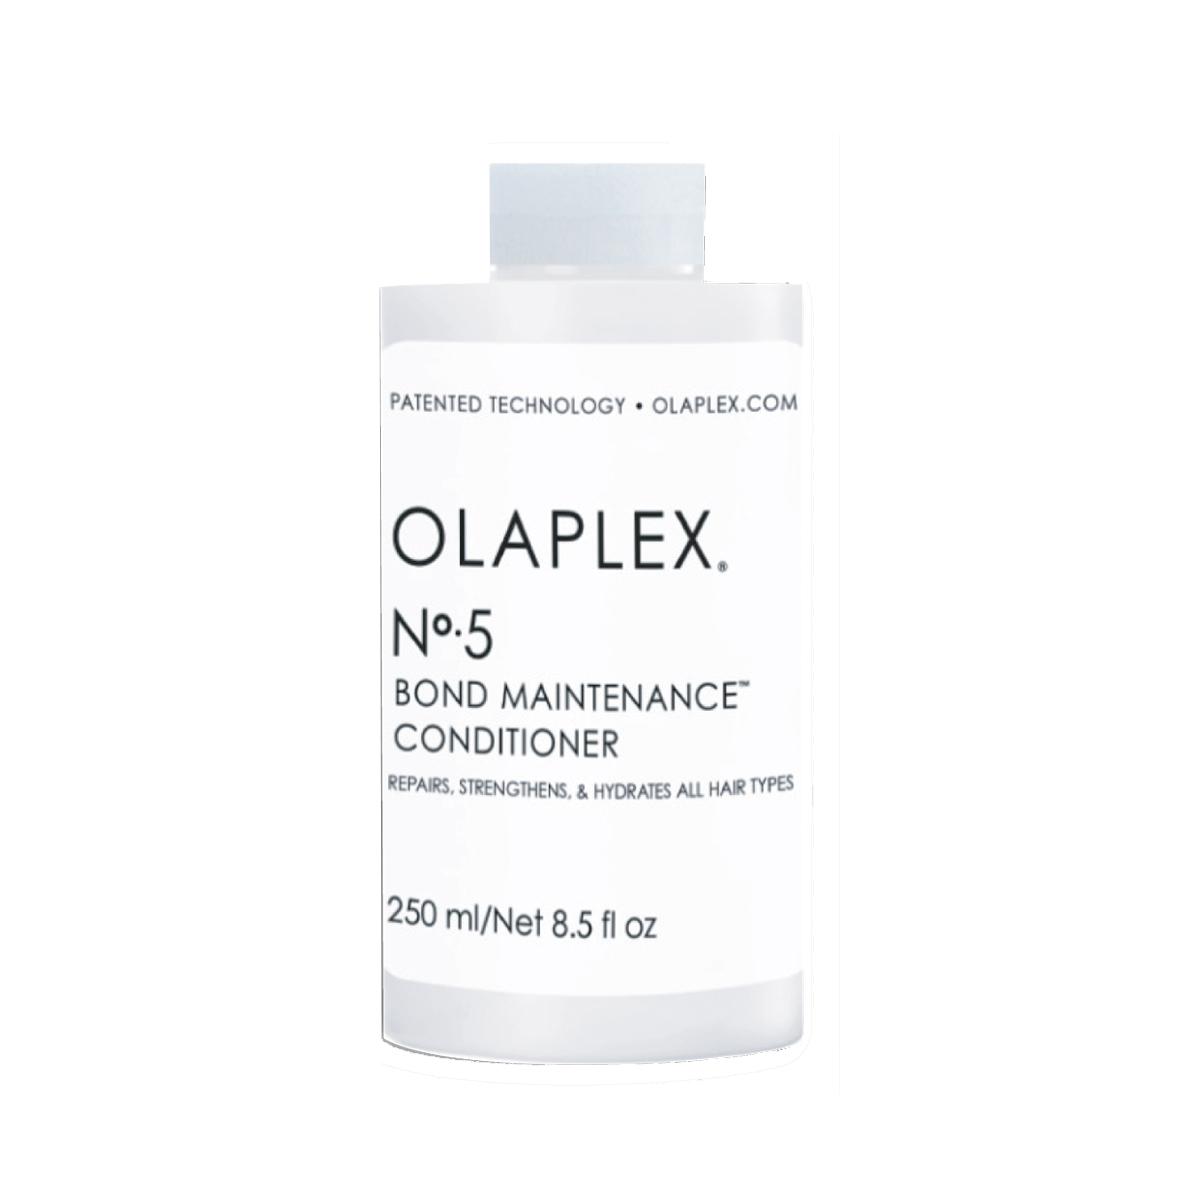 Olaplex No.5 Bond Maintenance™ Conditioner